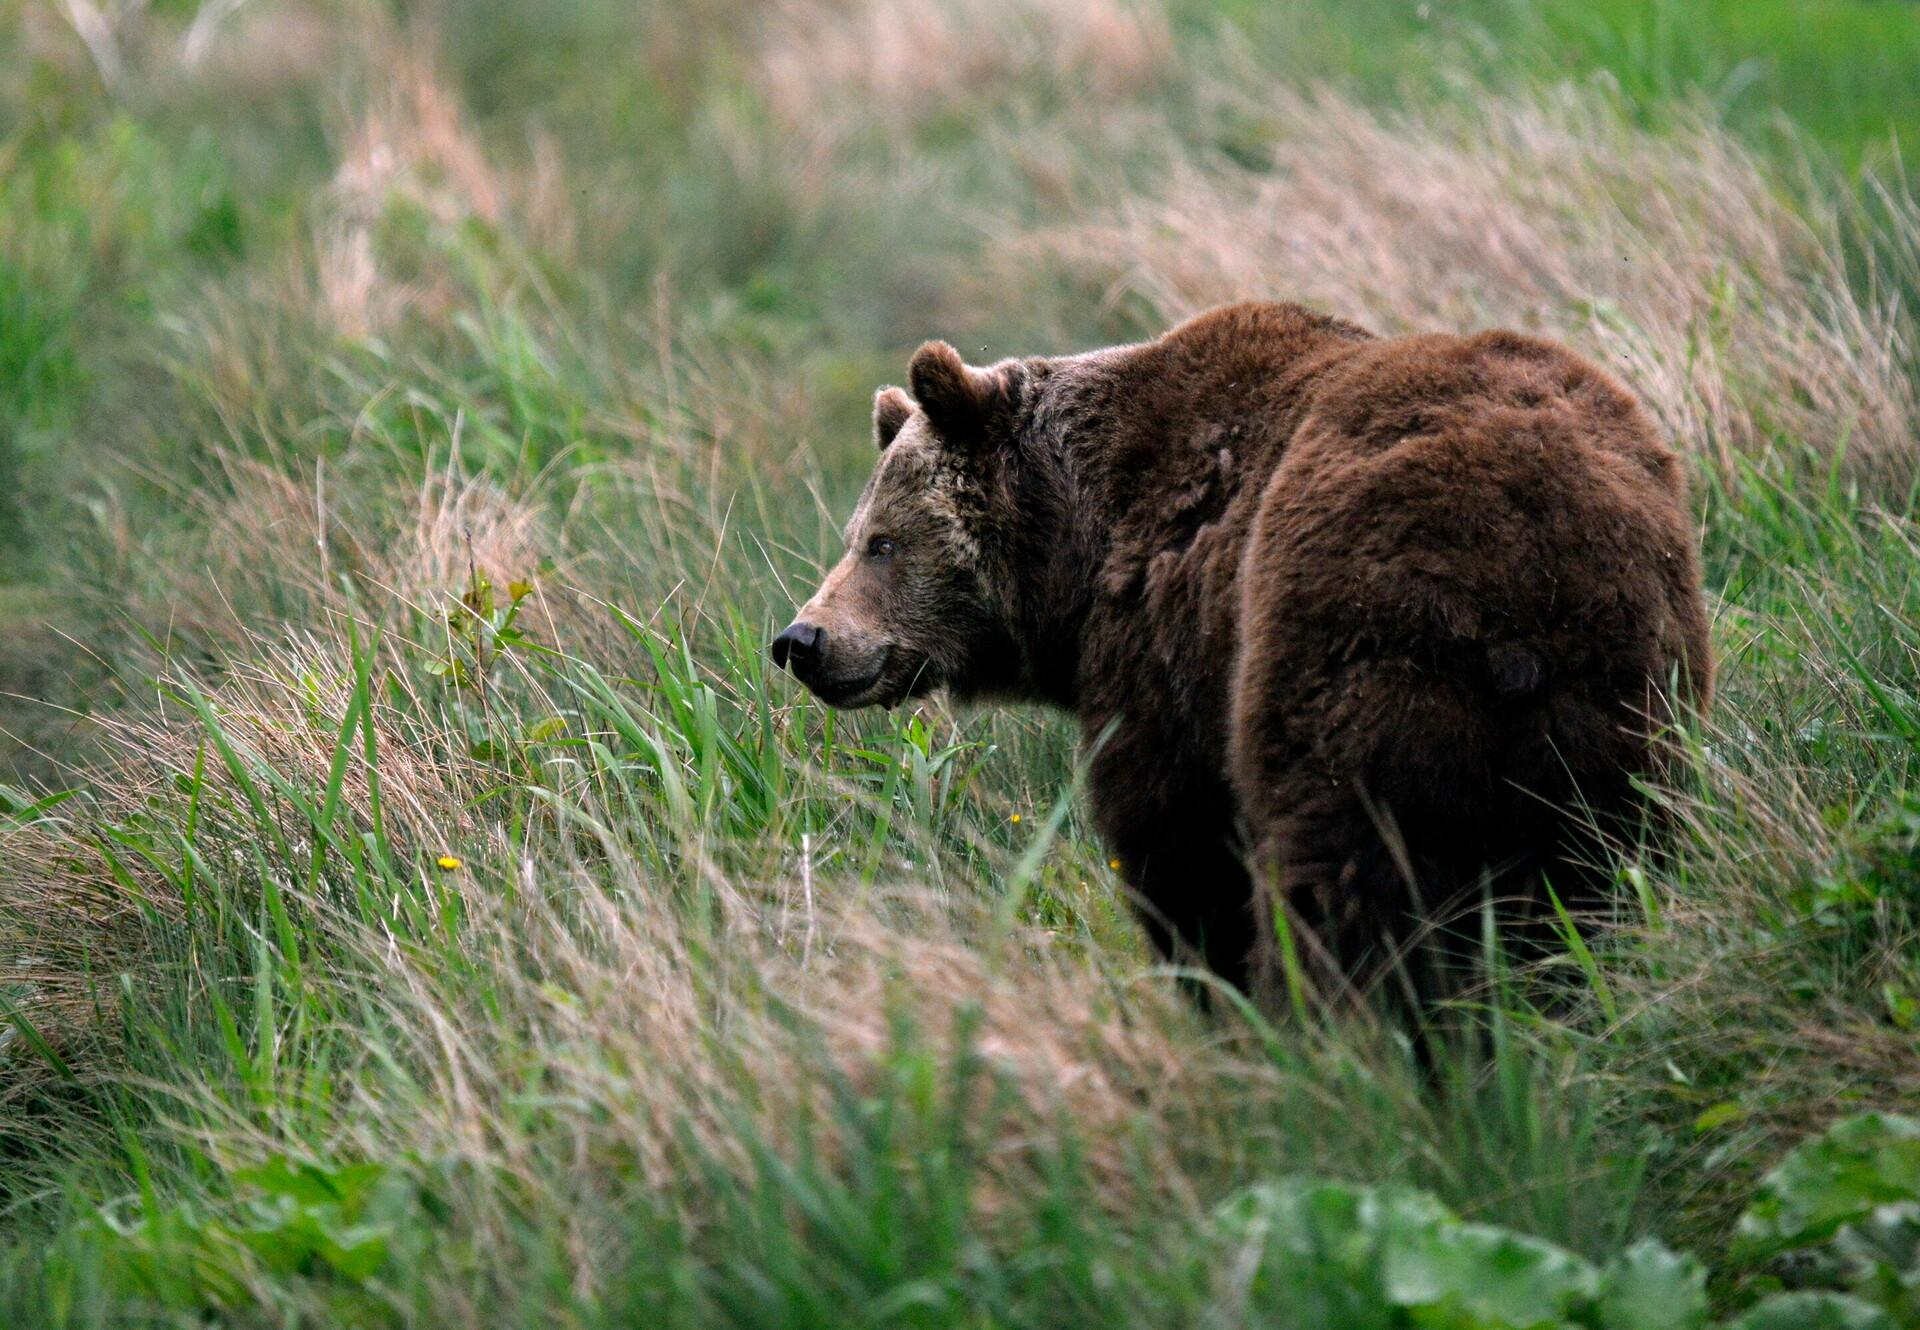 Bear Katja